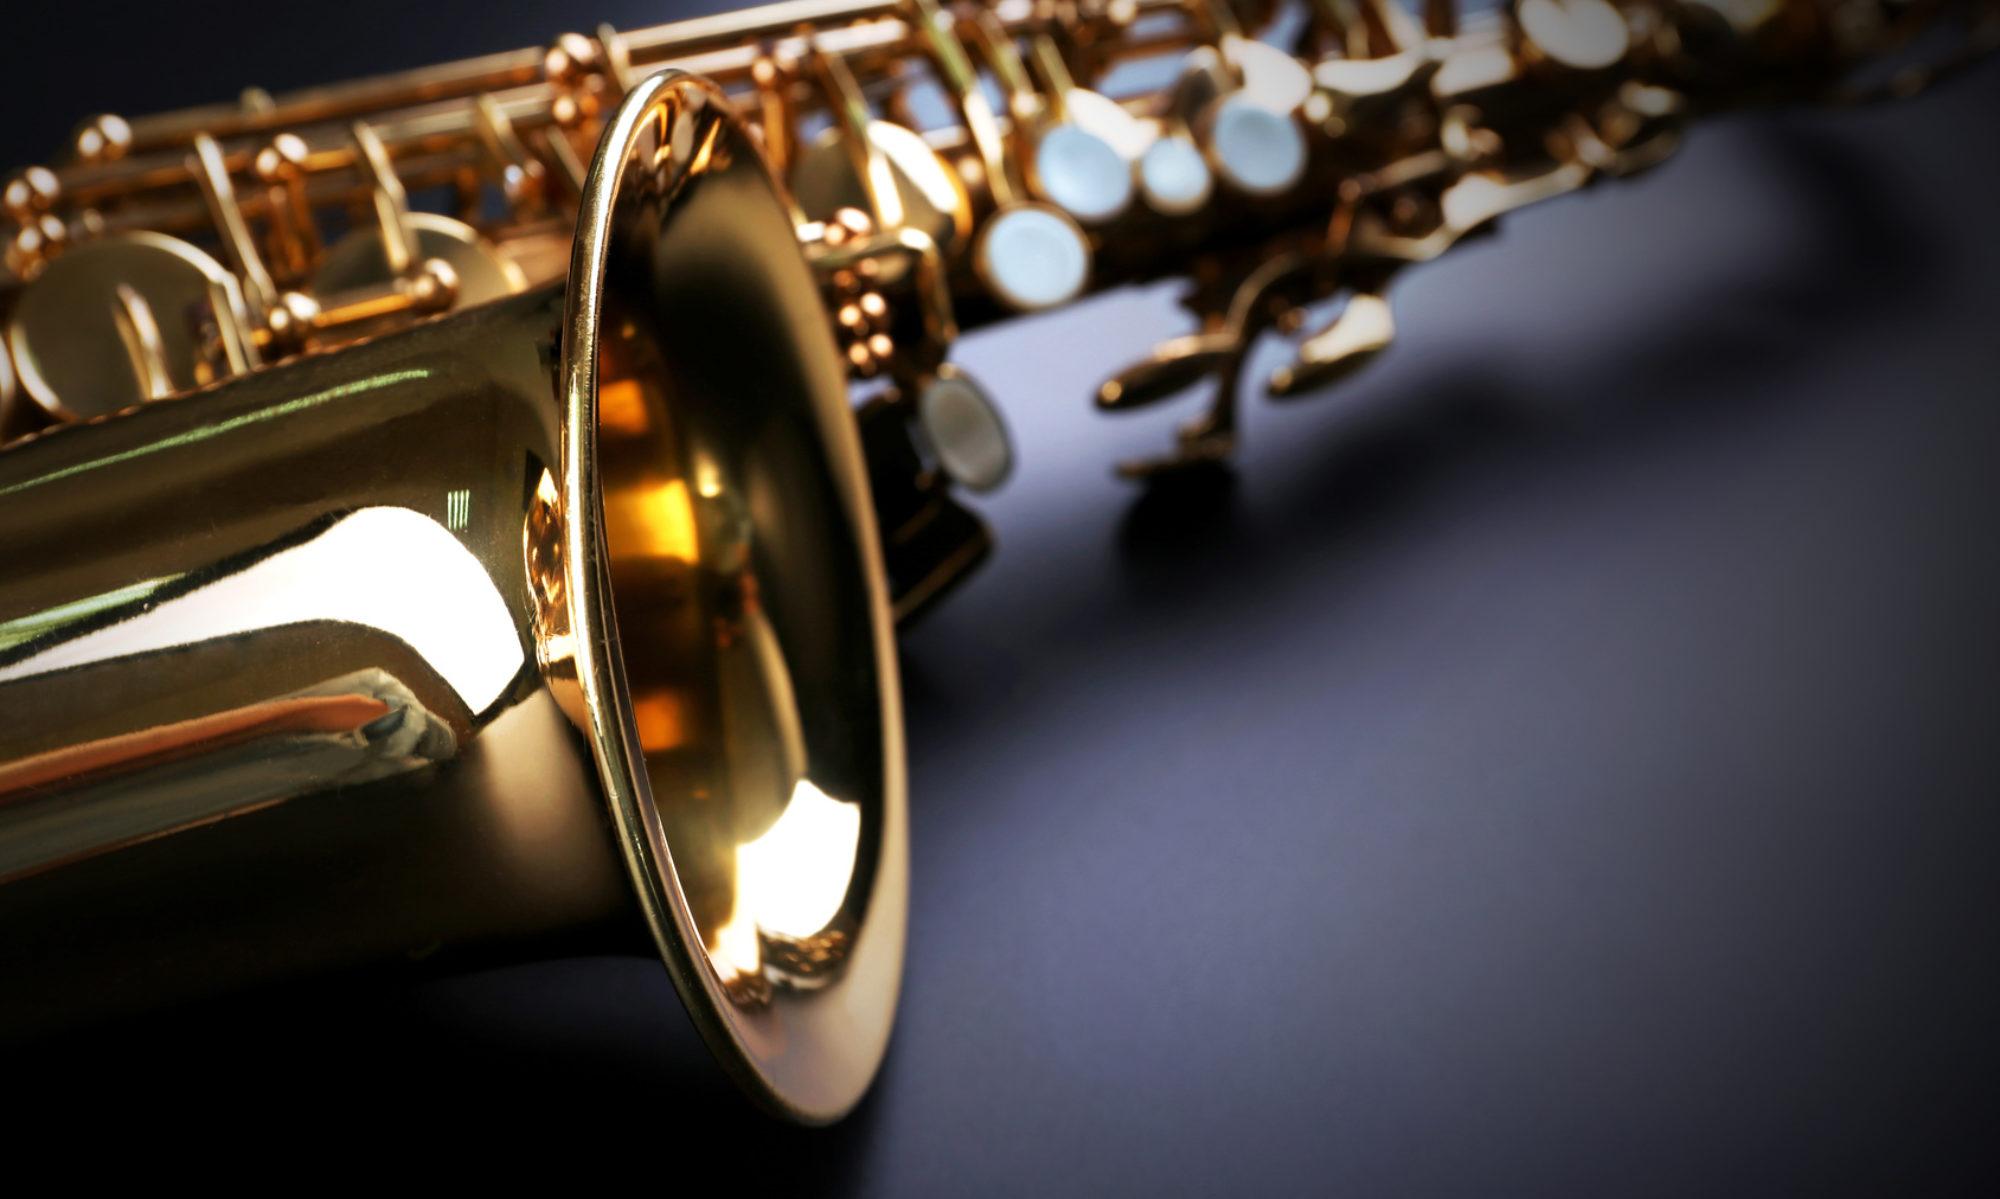 saxophon-lernen-muenchen